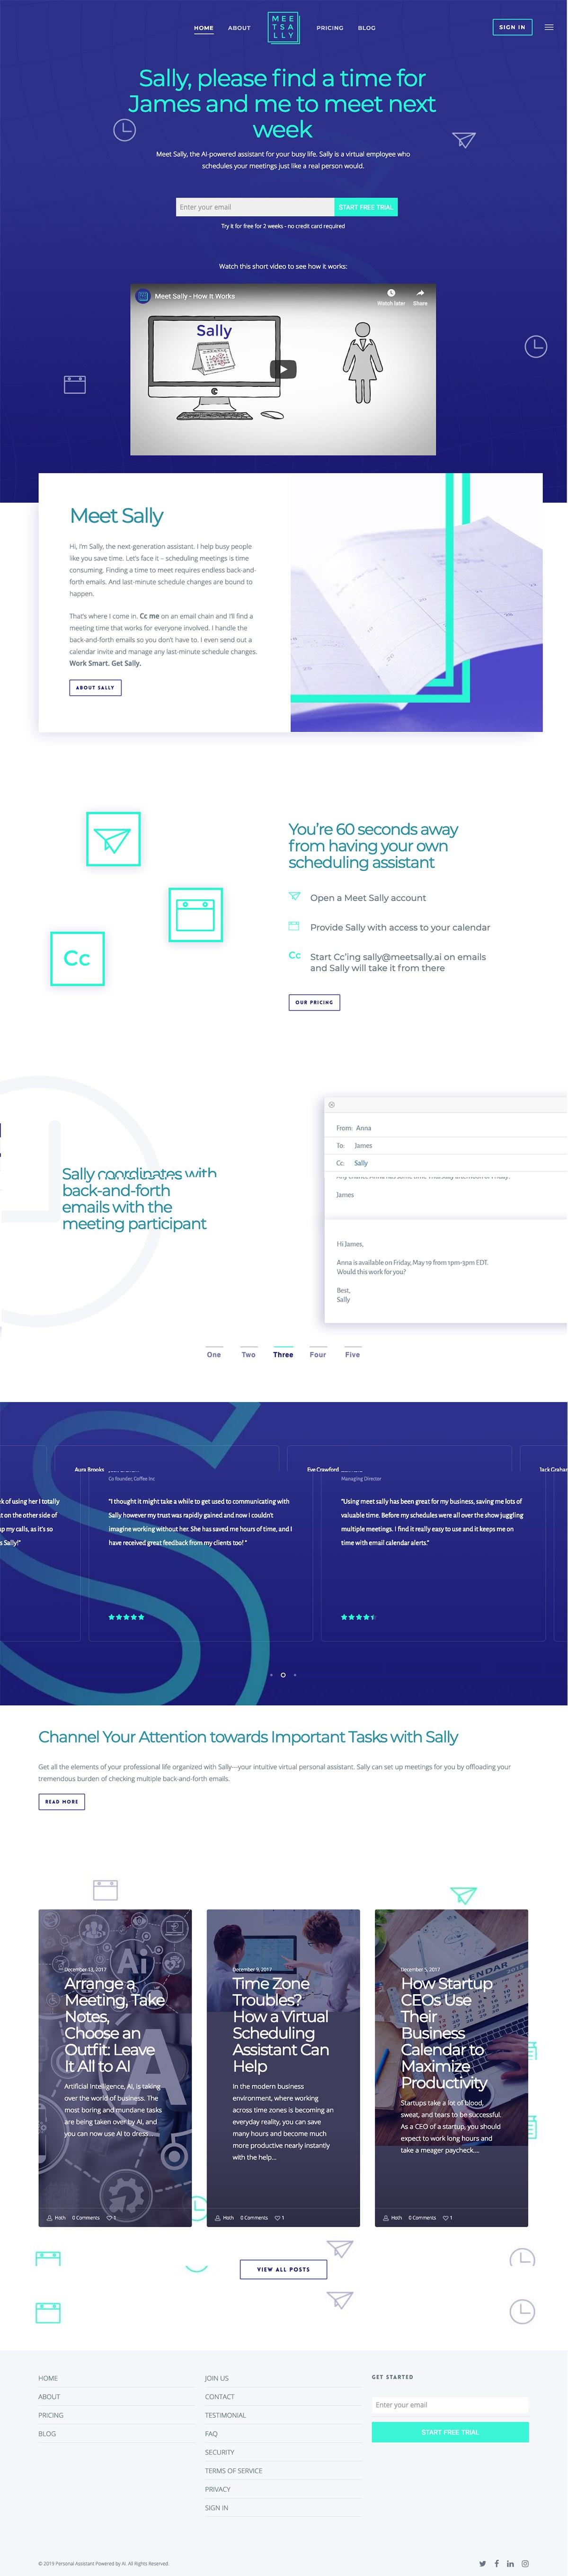 eCommerce website: Meet Sally